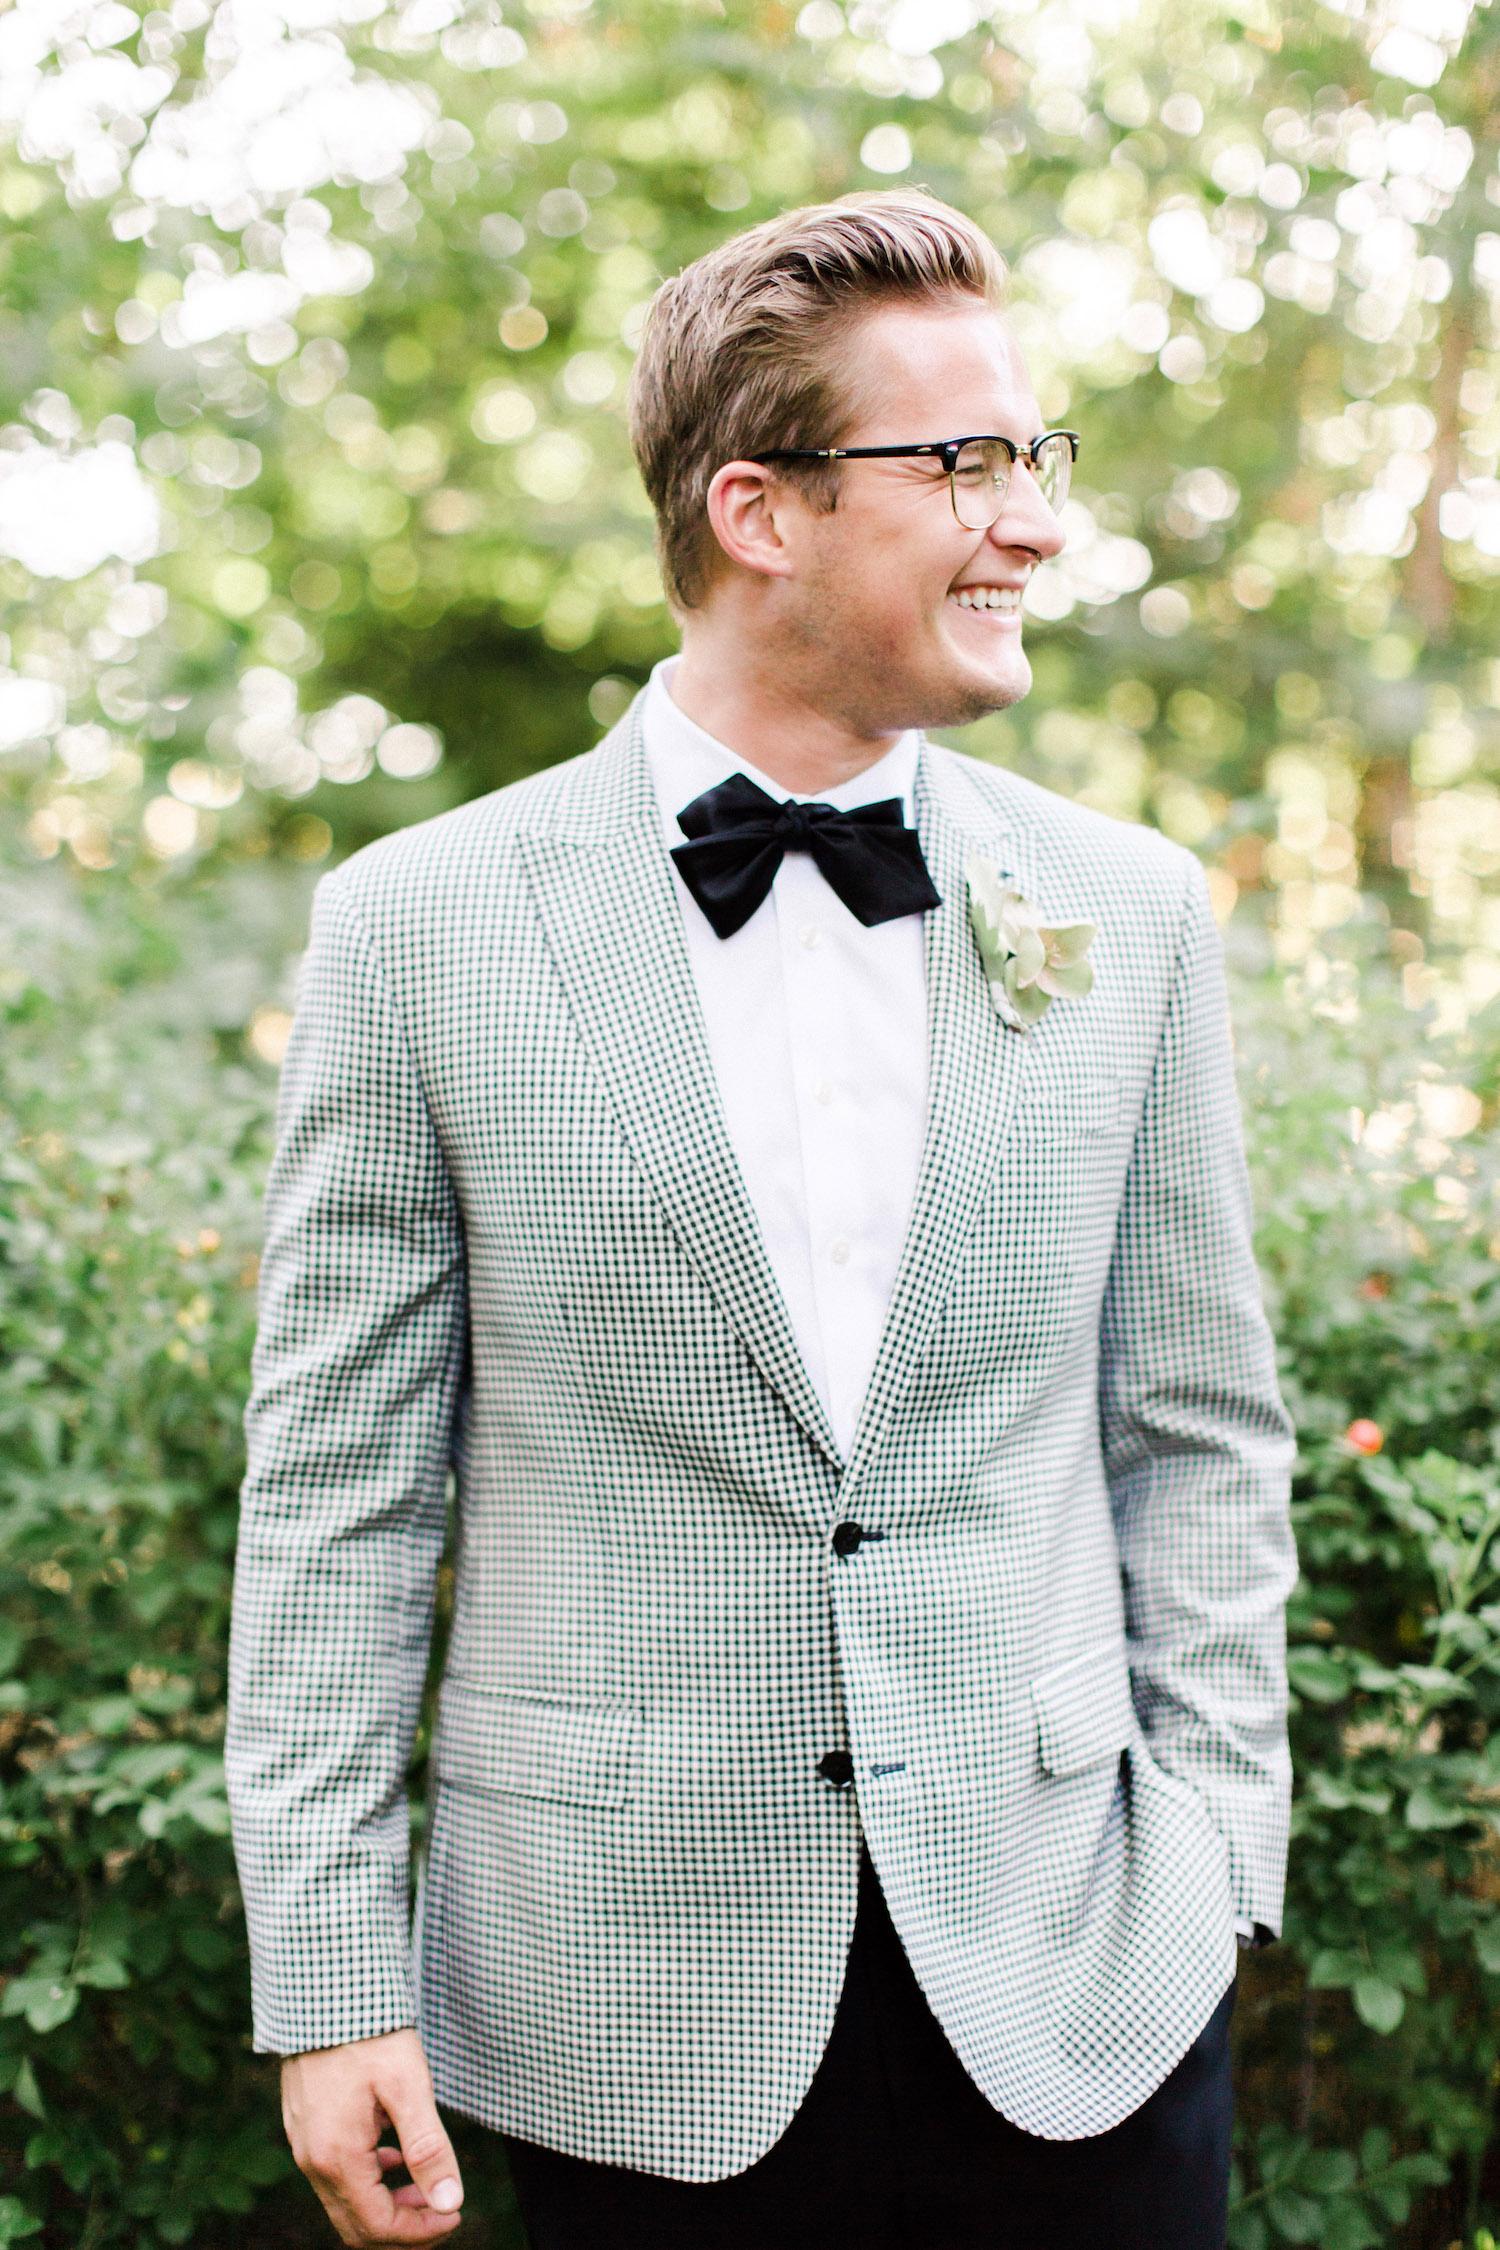 Should the Groom Splurge on a Custom Wedding Suit?